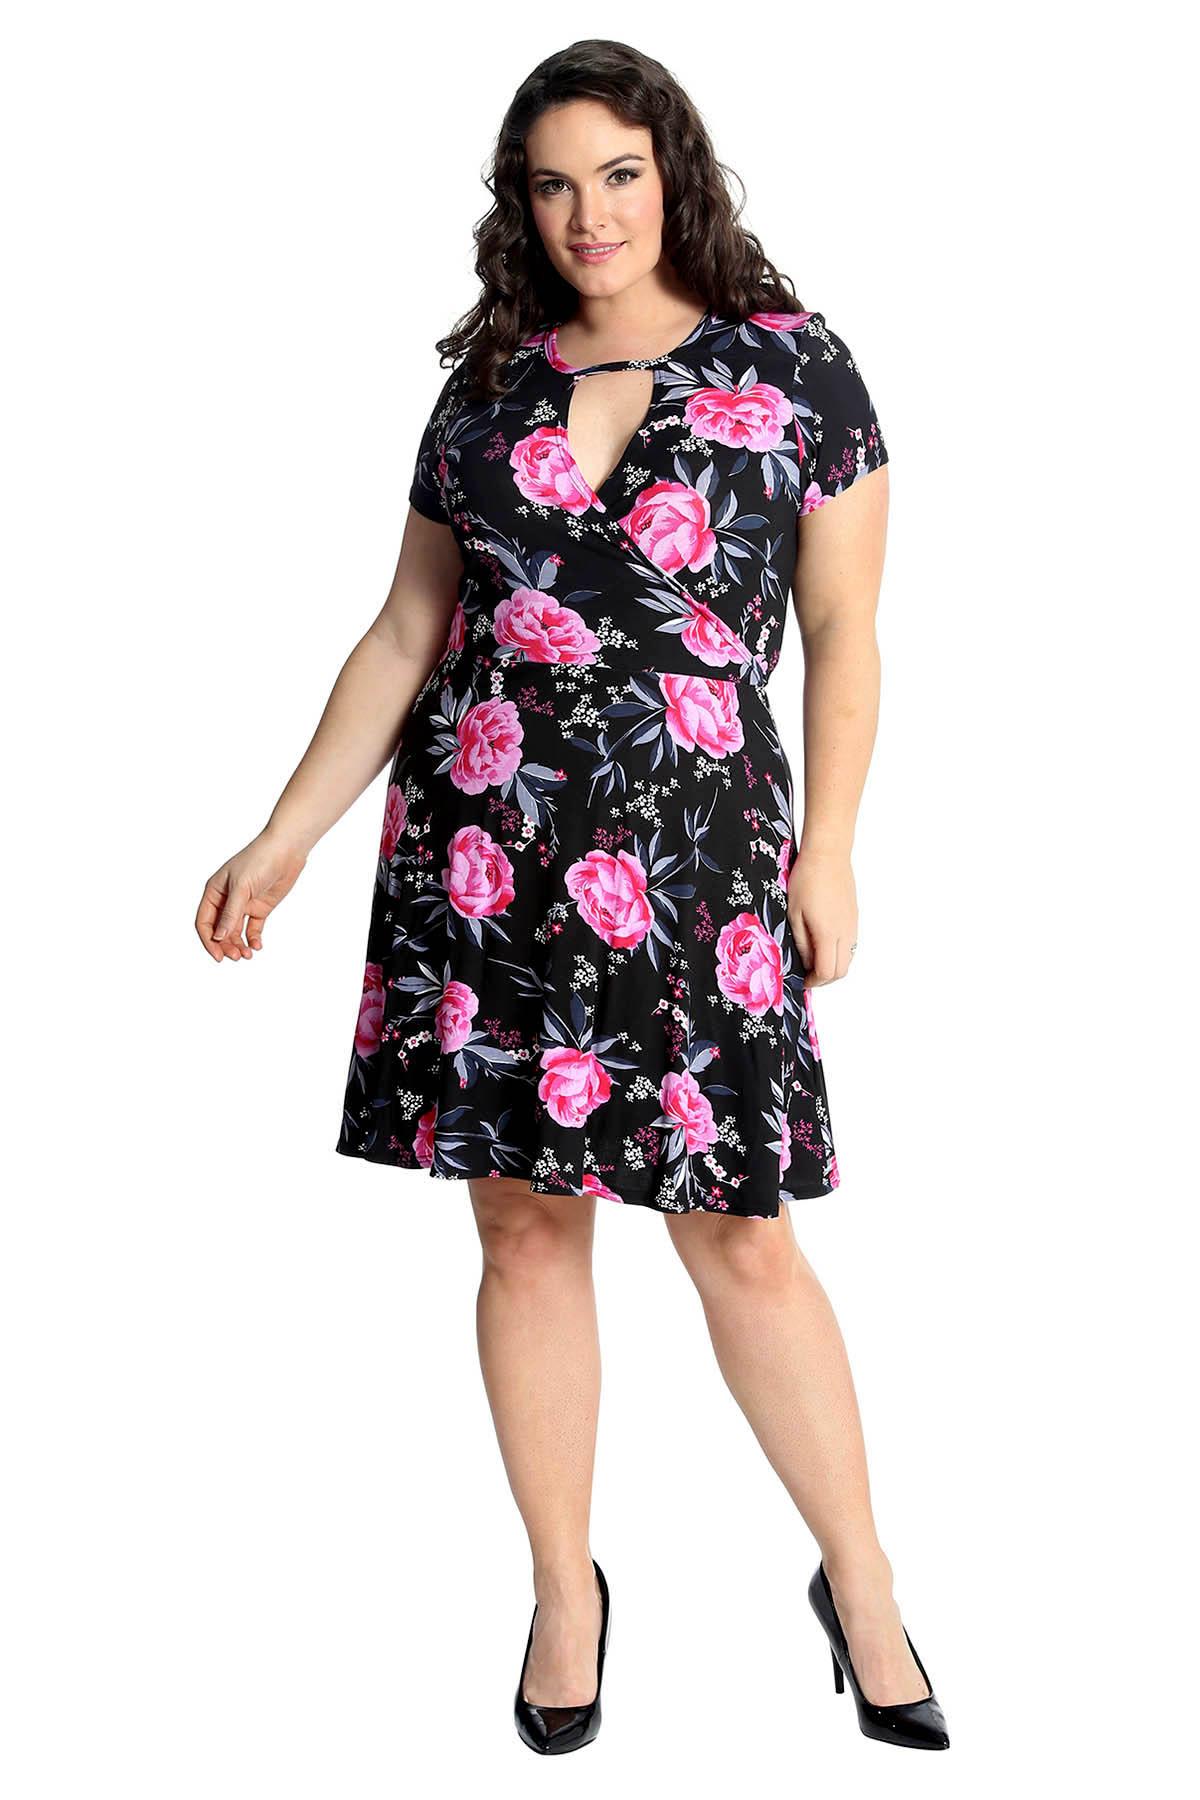 Neu Damen Kleid Übergröße Frauen Rose Blumen Muster Crossover Skater Nouve